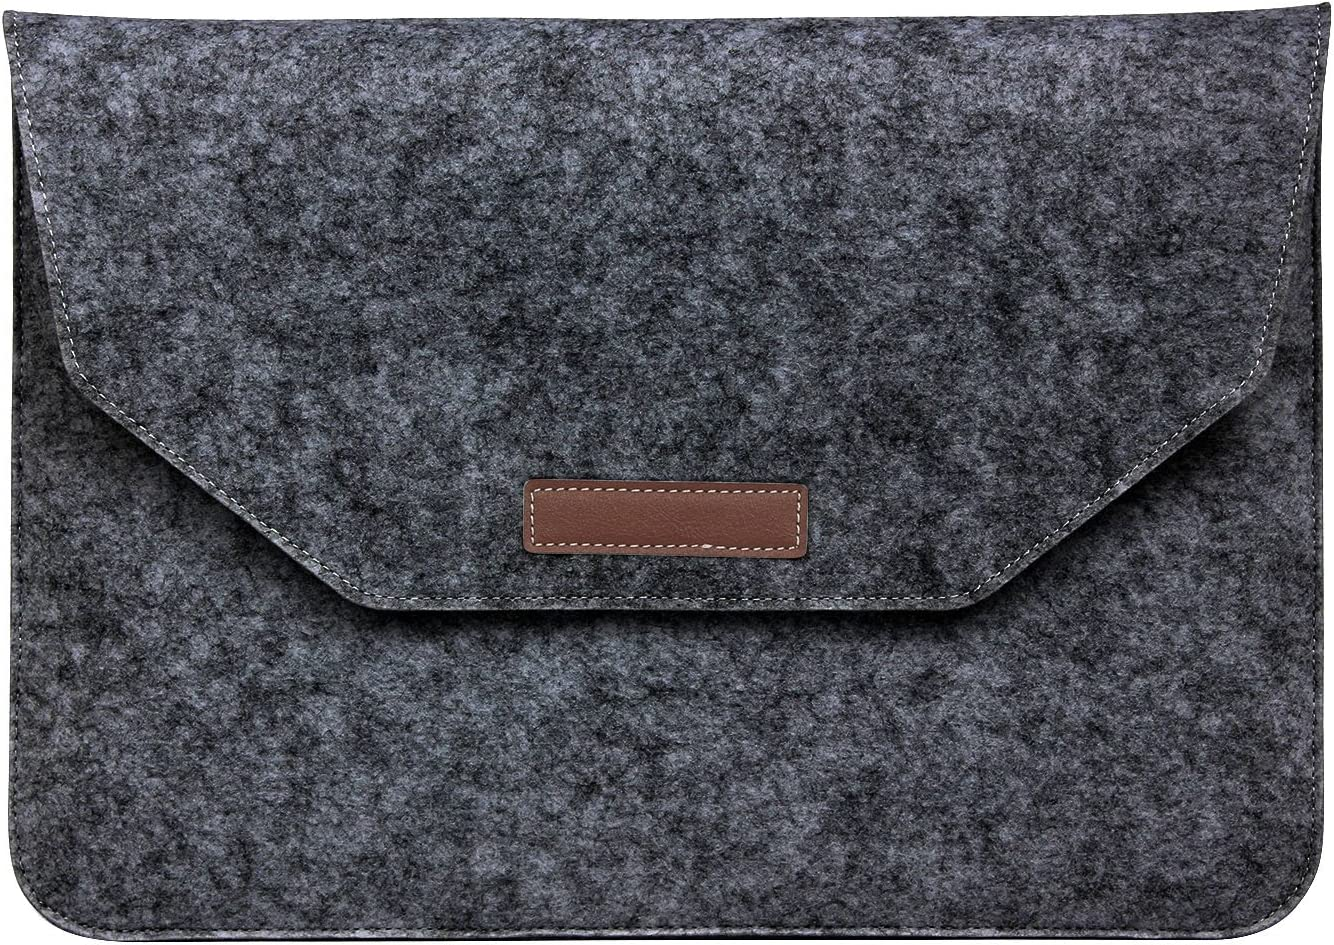 Binguowang14-15.4 inch Laptop Sleeve Felt Ranking TOP13 Max 49% OFF Notebook Case B